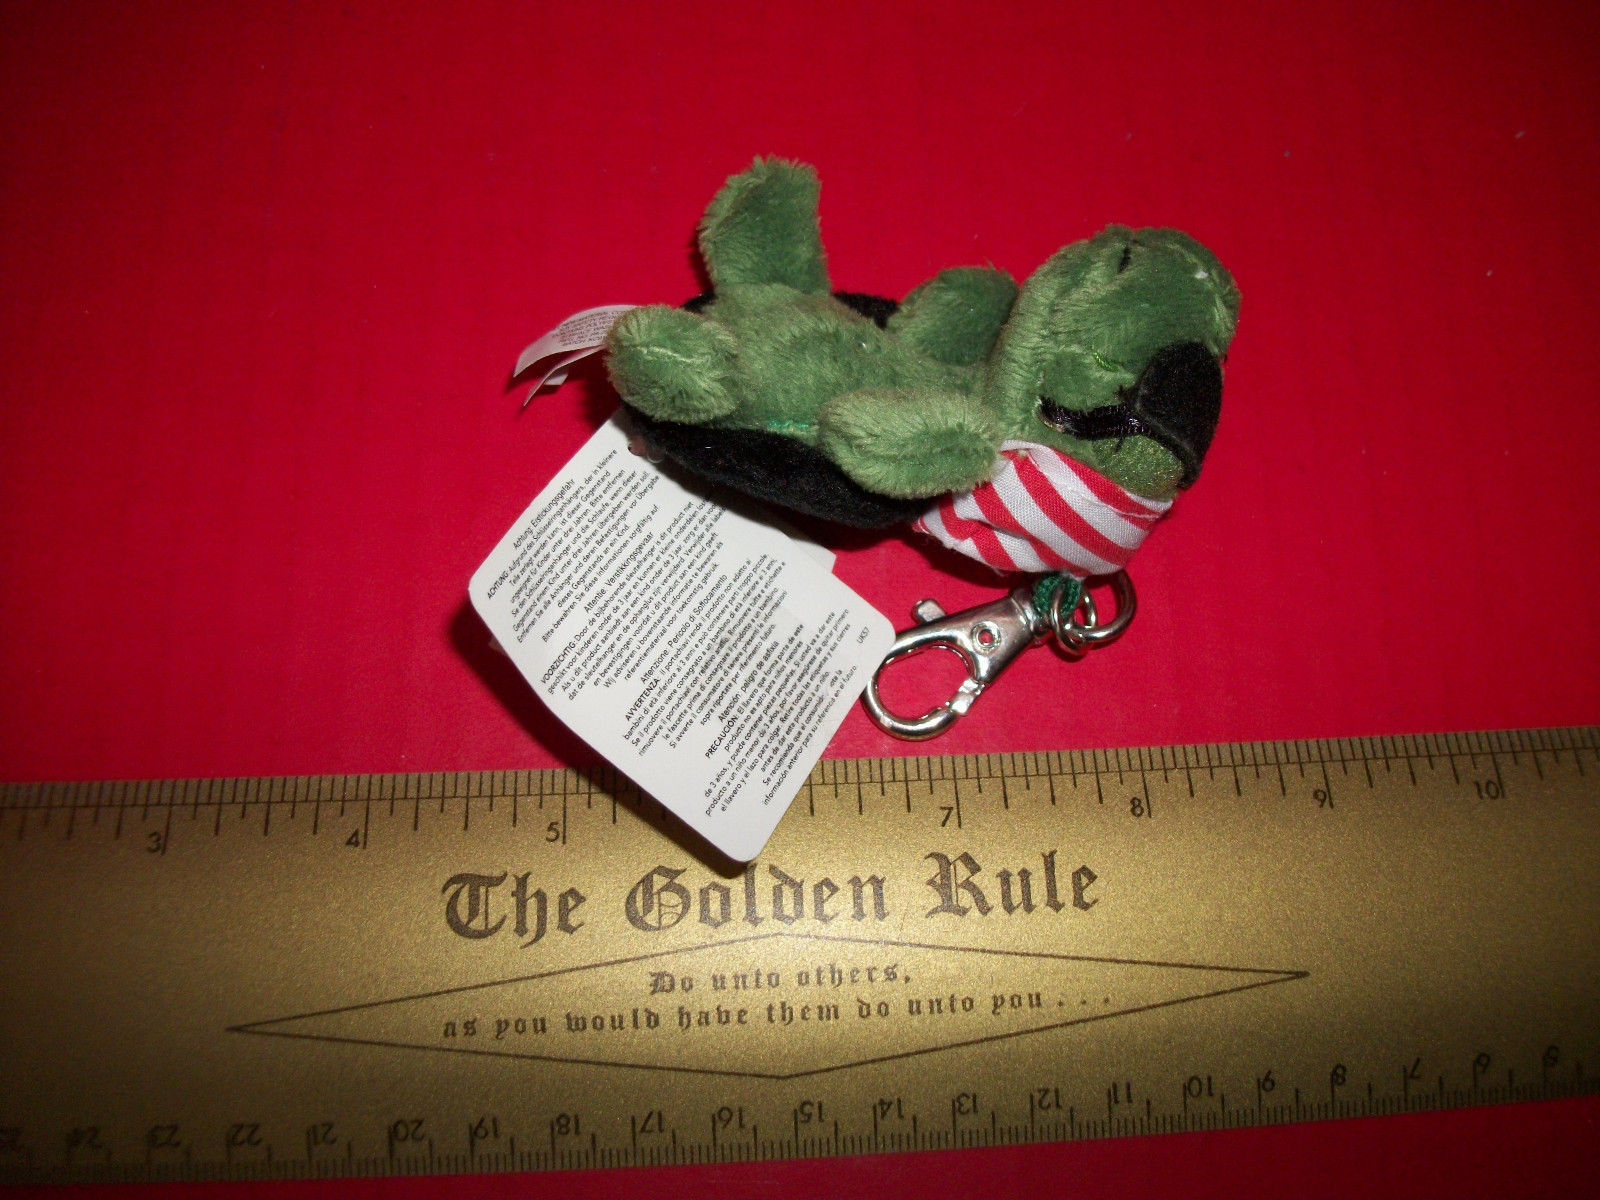 Toy Gift Russ Plush Shecky Pirate Turtle Stuffed Animal Keychain Eye Patch New